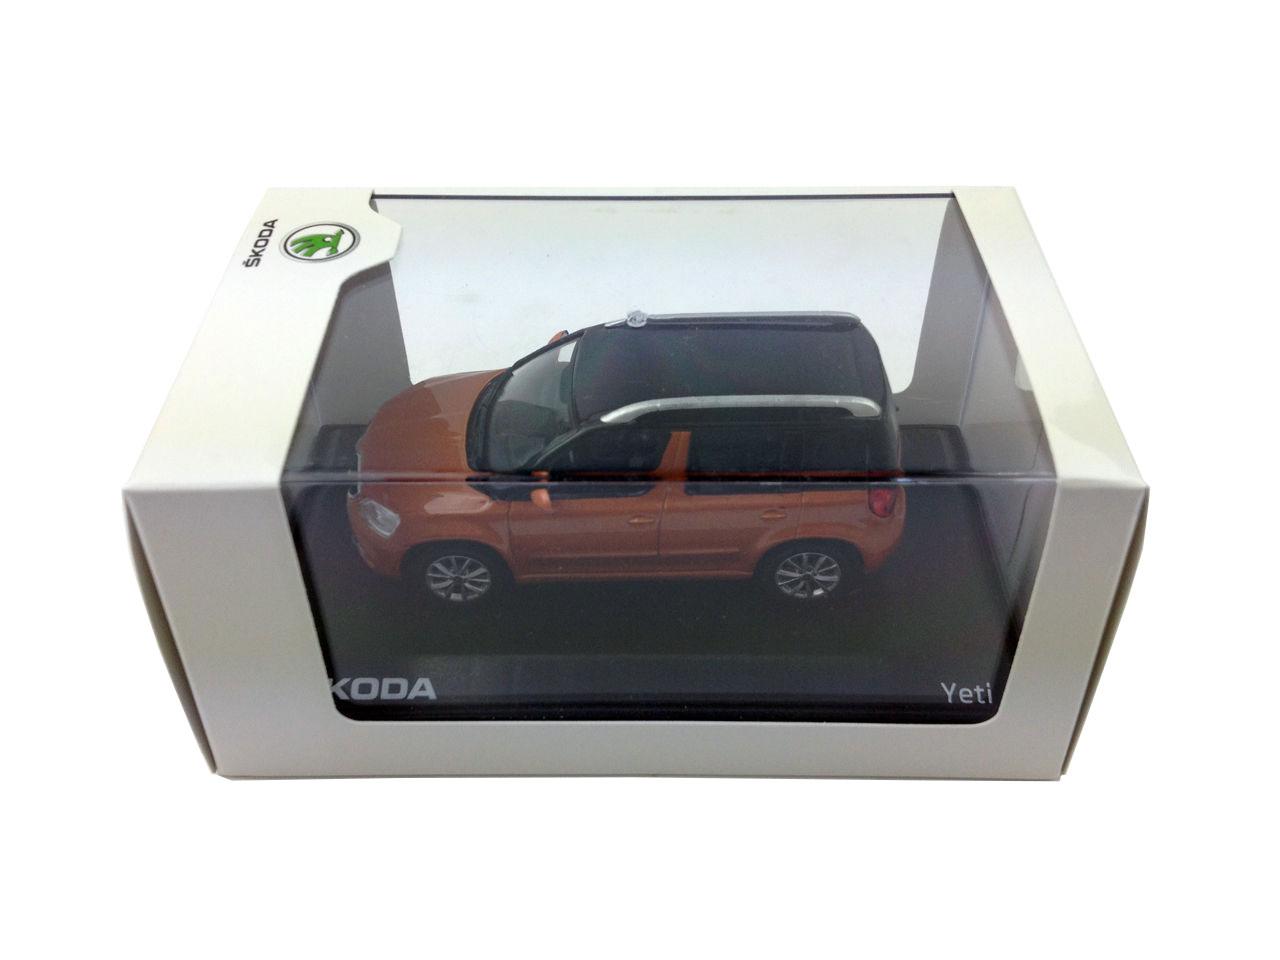 Skoda Yeti 1/43 Scale Diecast Model Car 9